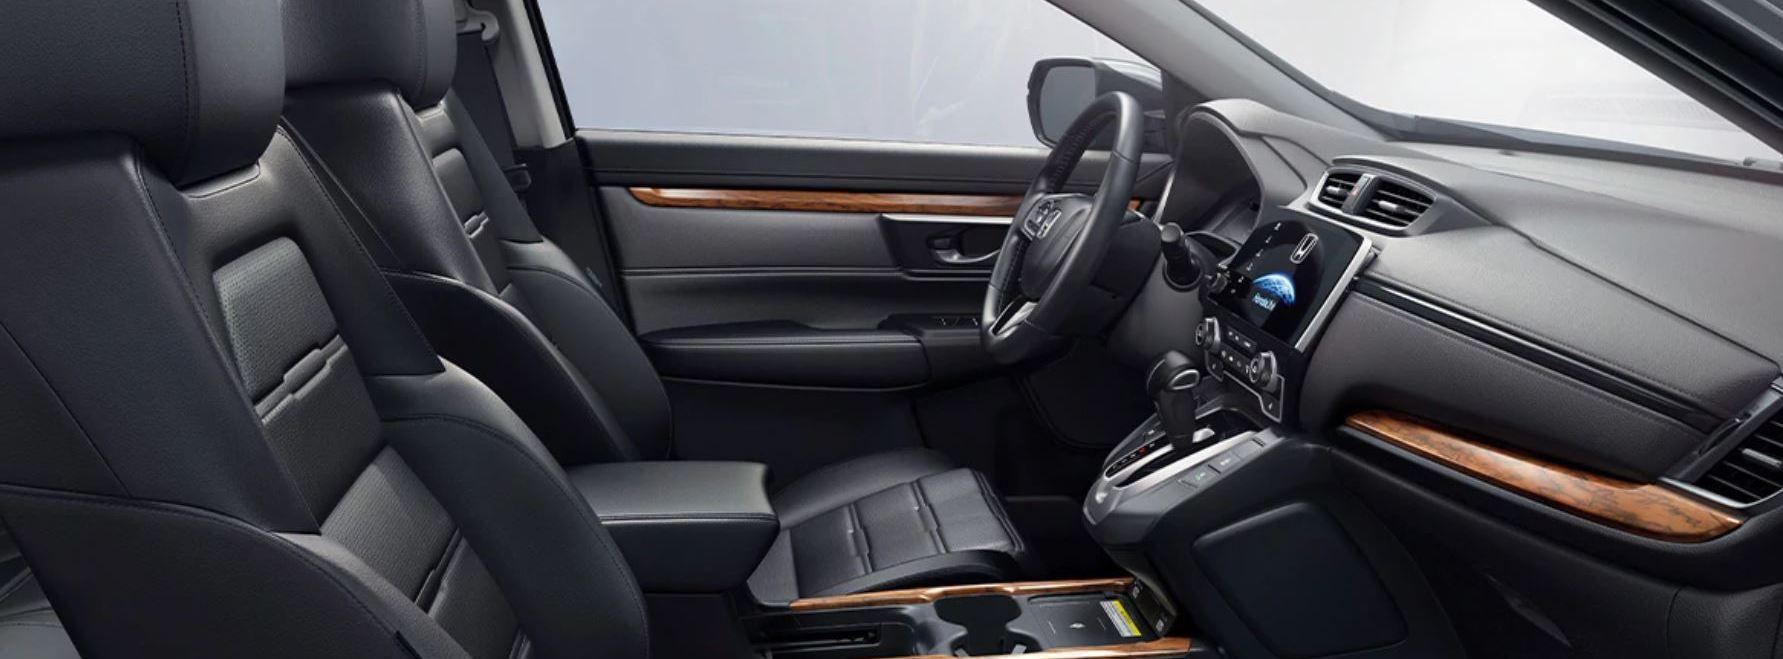 2020 Honda CR-V Seating